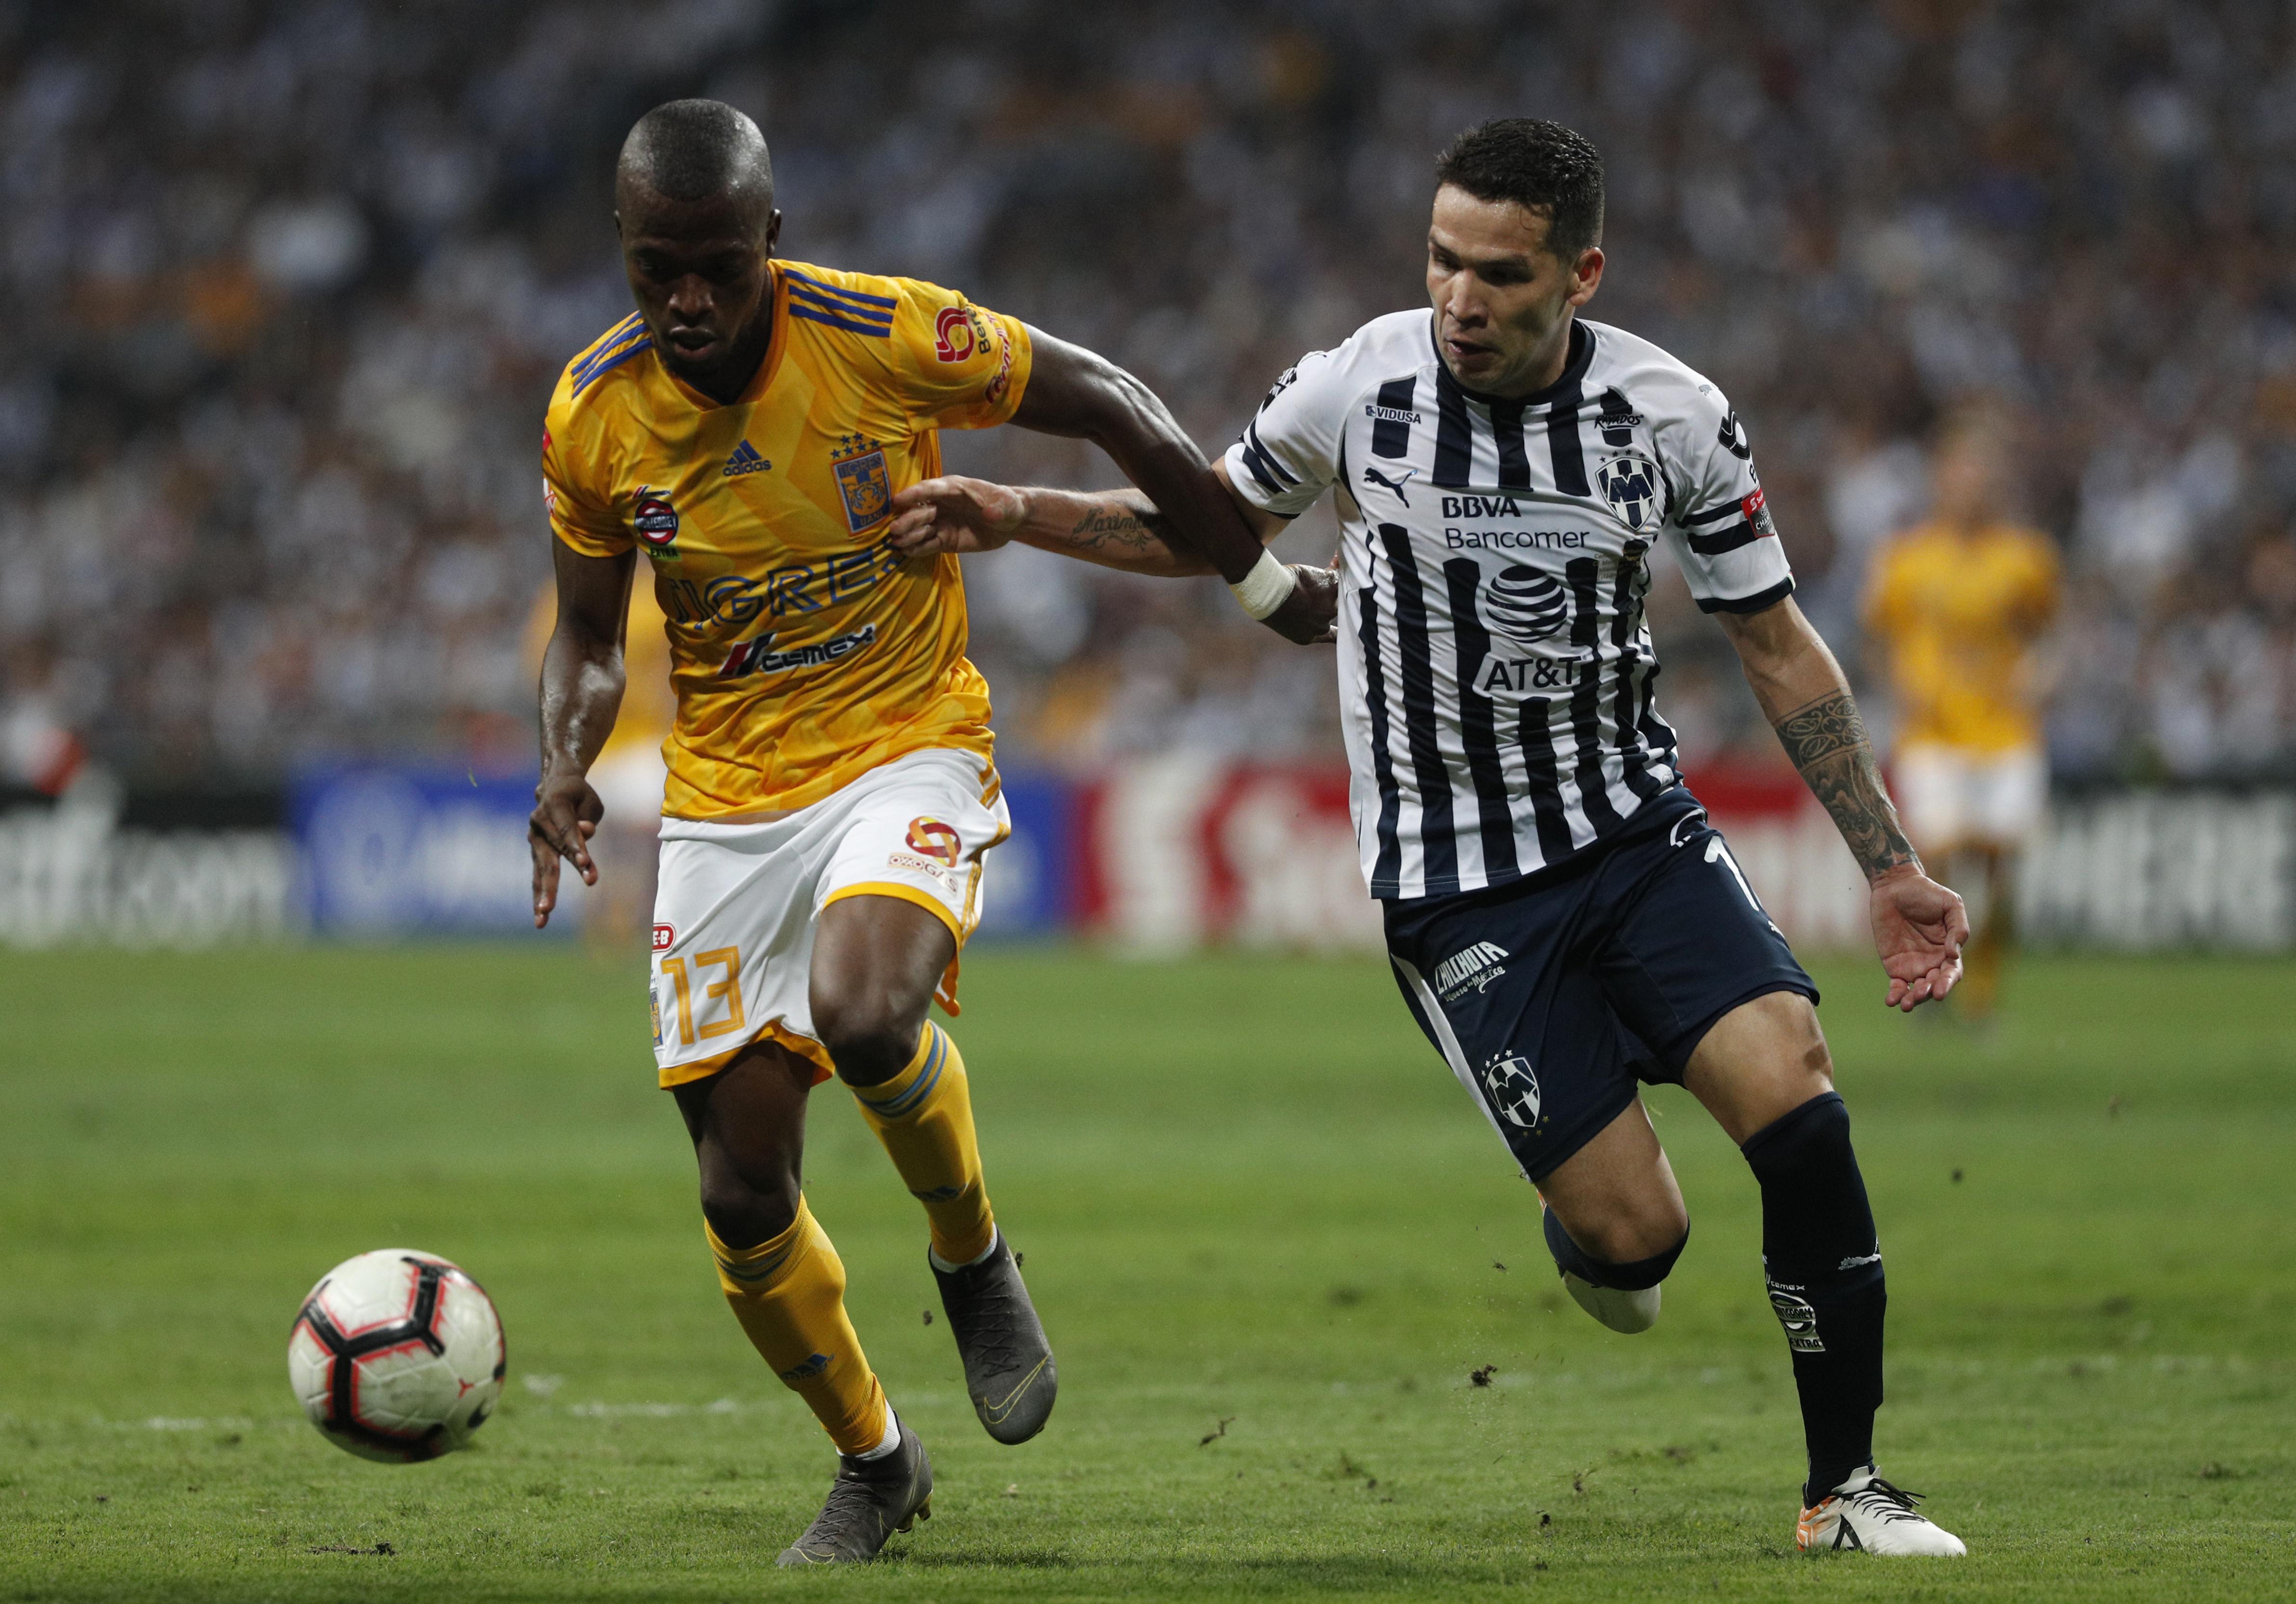 Tigres Vs Leon Free Live Stream Watch Liga Mx Clausura Final 2019 First Leg Online 5 23 19 Time Tv Channel Nj Com